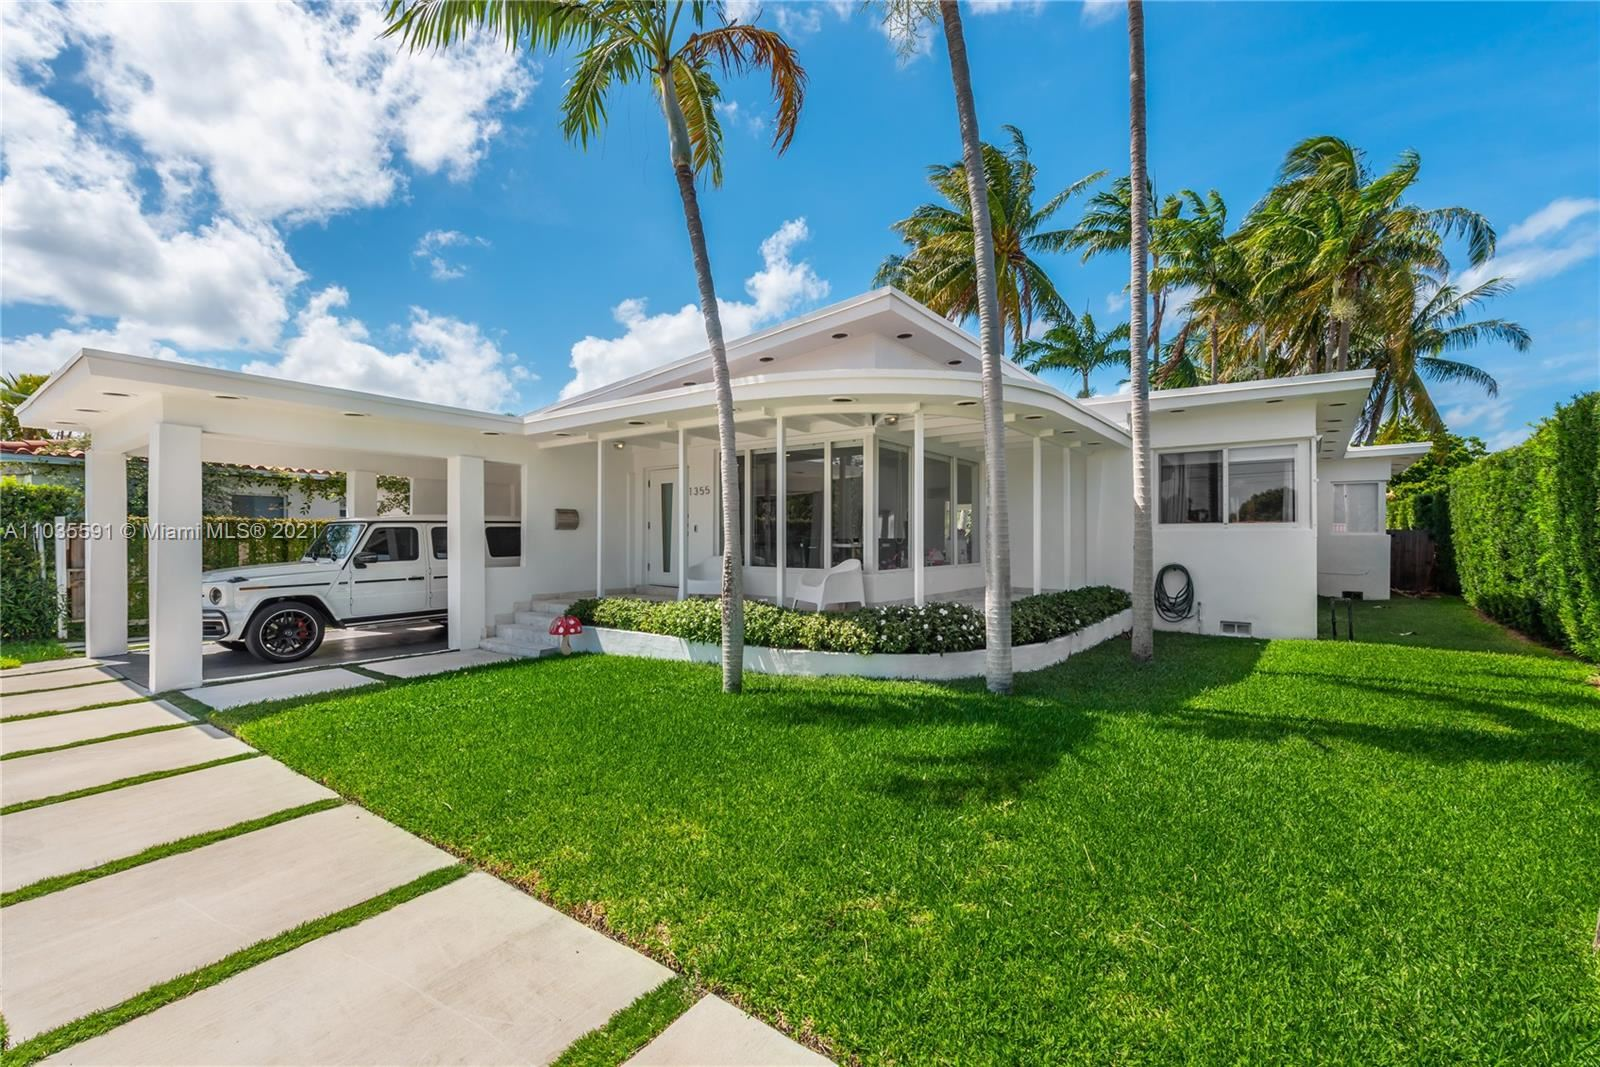 Photo of Miami Beach, FL 33141 (MLS # A11035591)